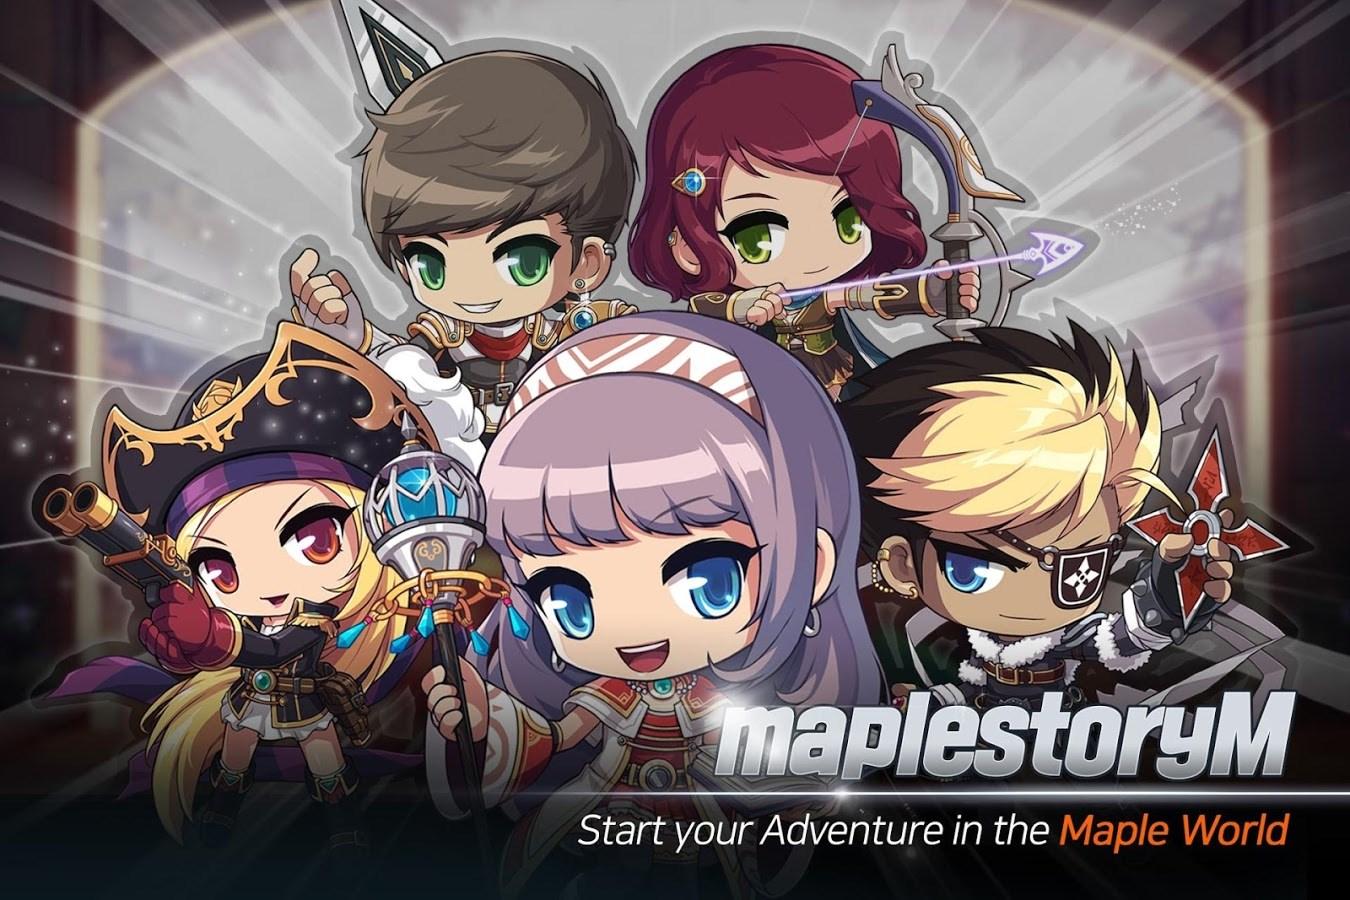 Maplestory M Download Para Android Gratis